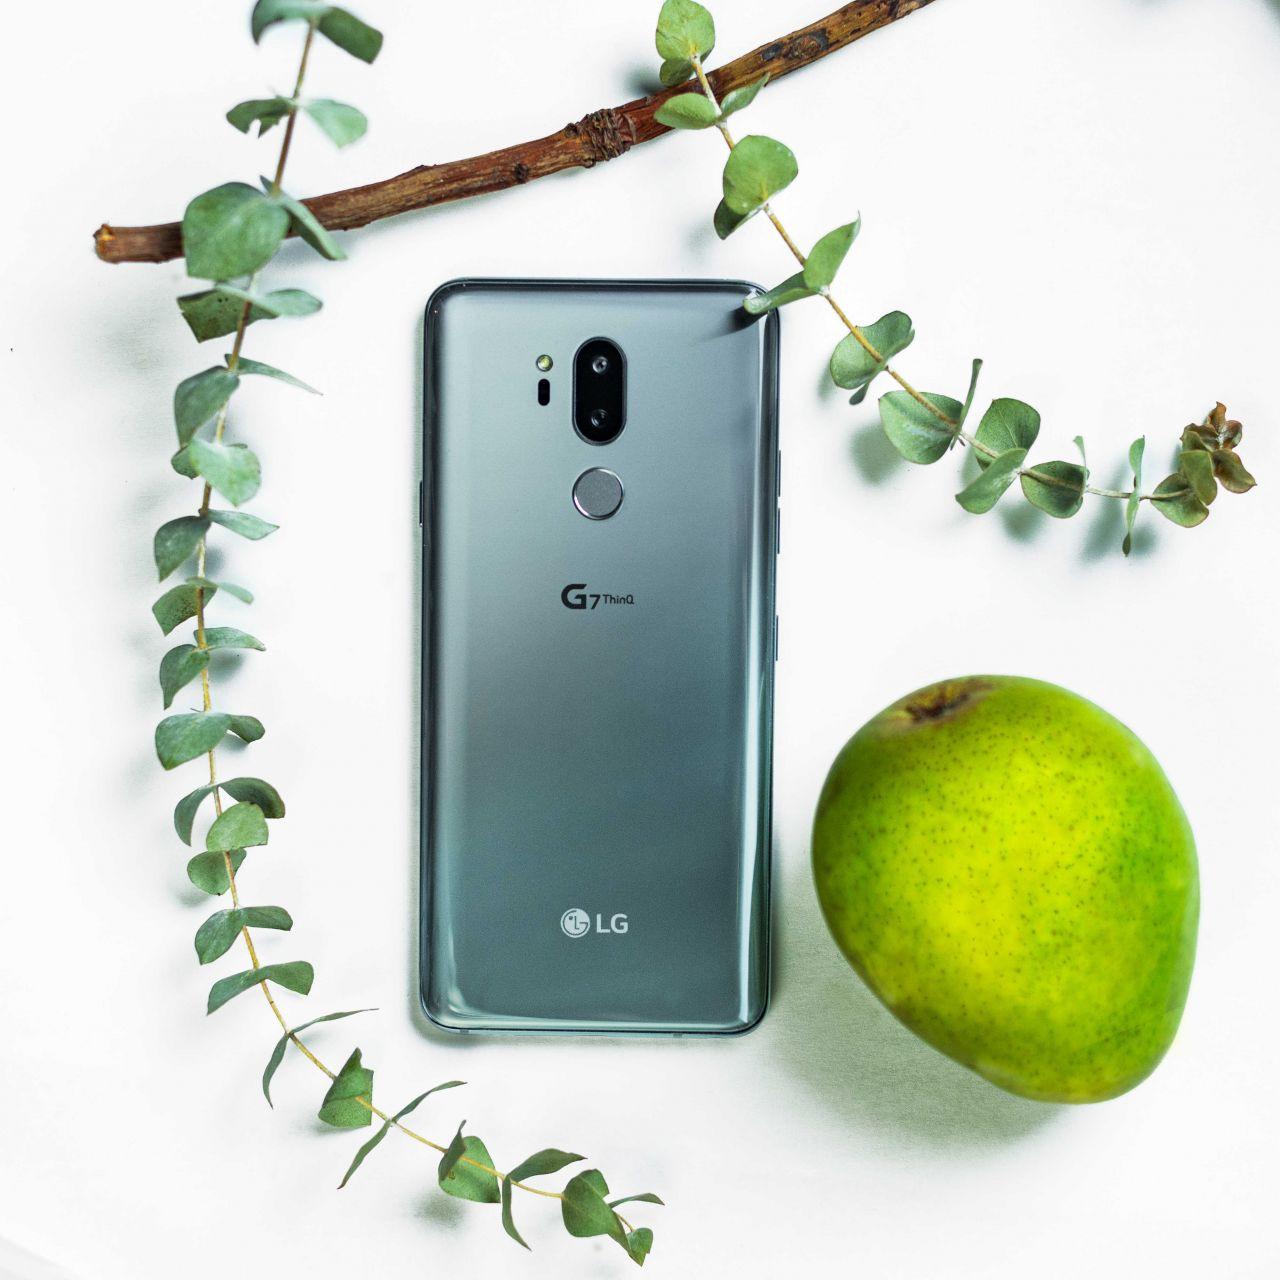 LG G7 ThinQ'in yeni görselleri - 2 - Page 1